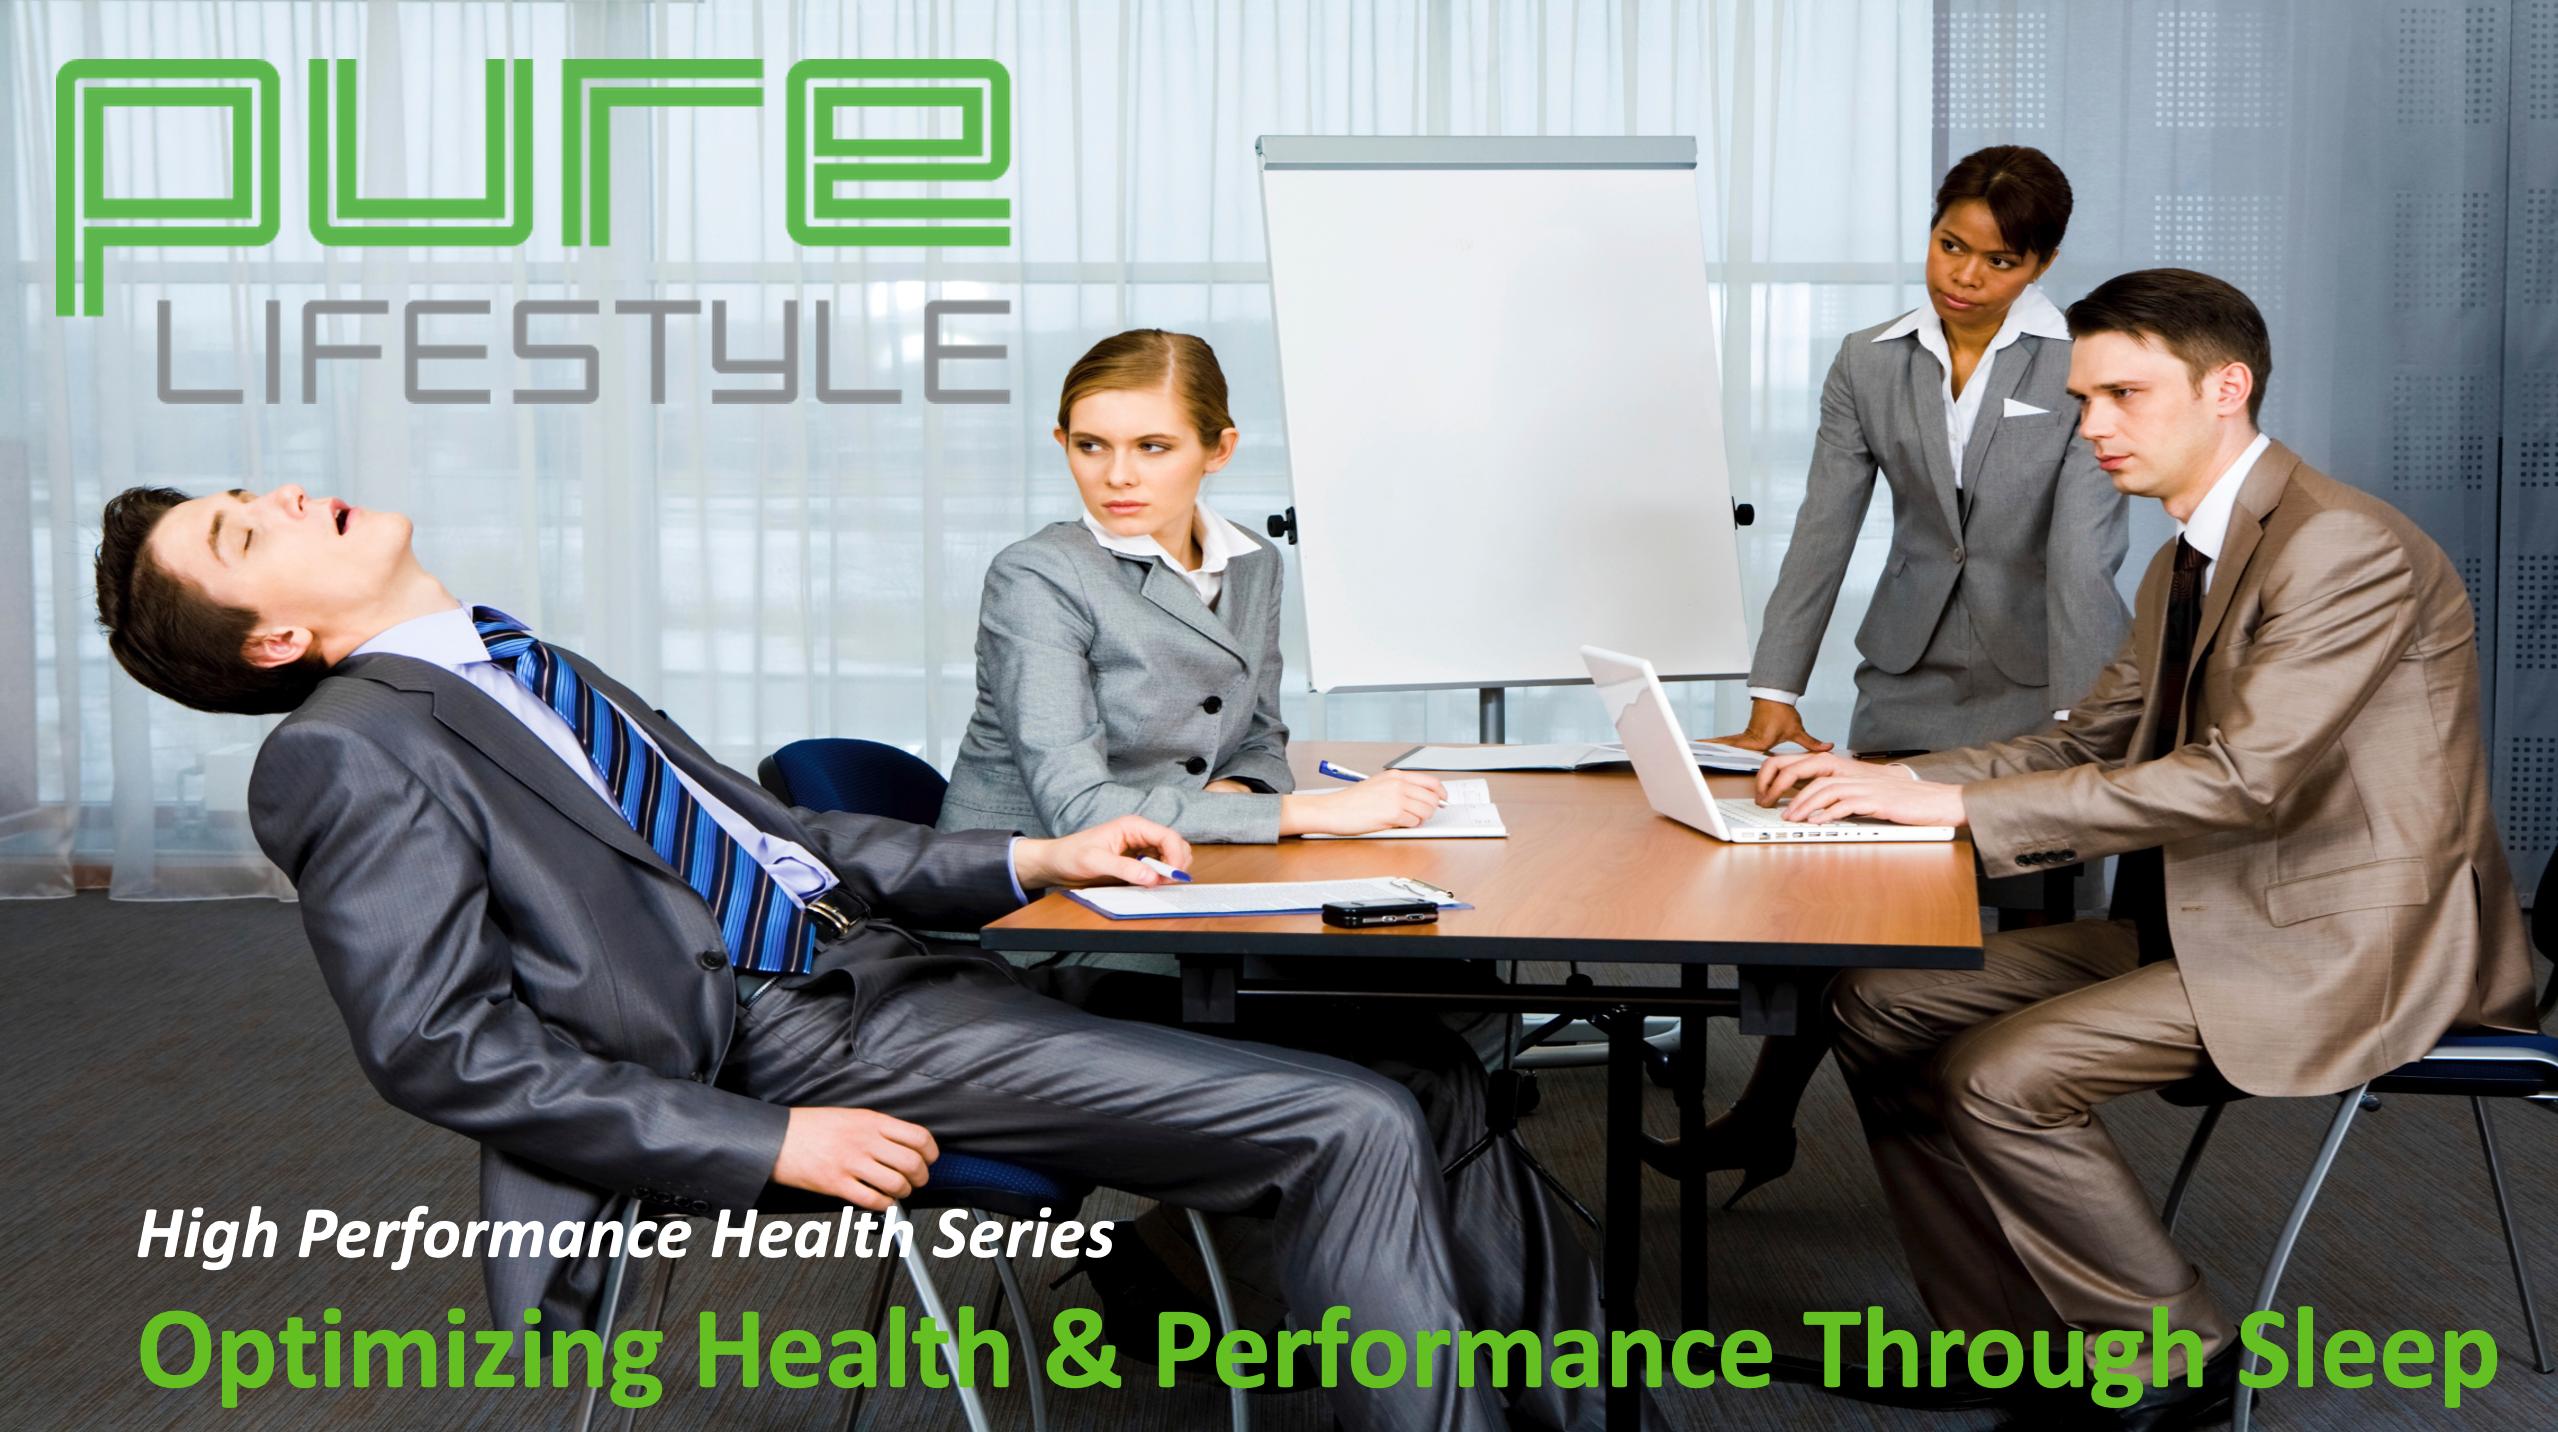 Optimizing health and performance through sleep banner